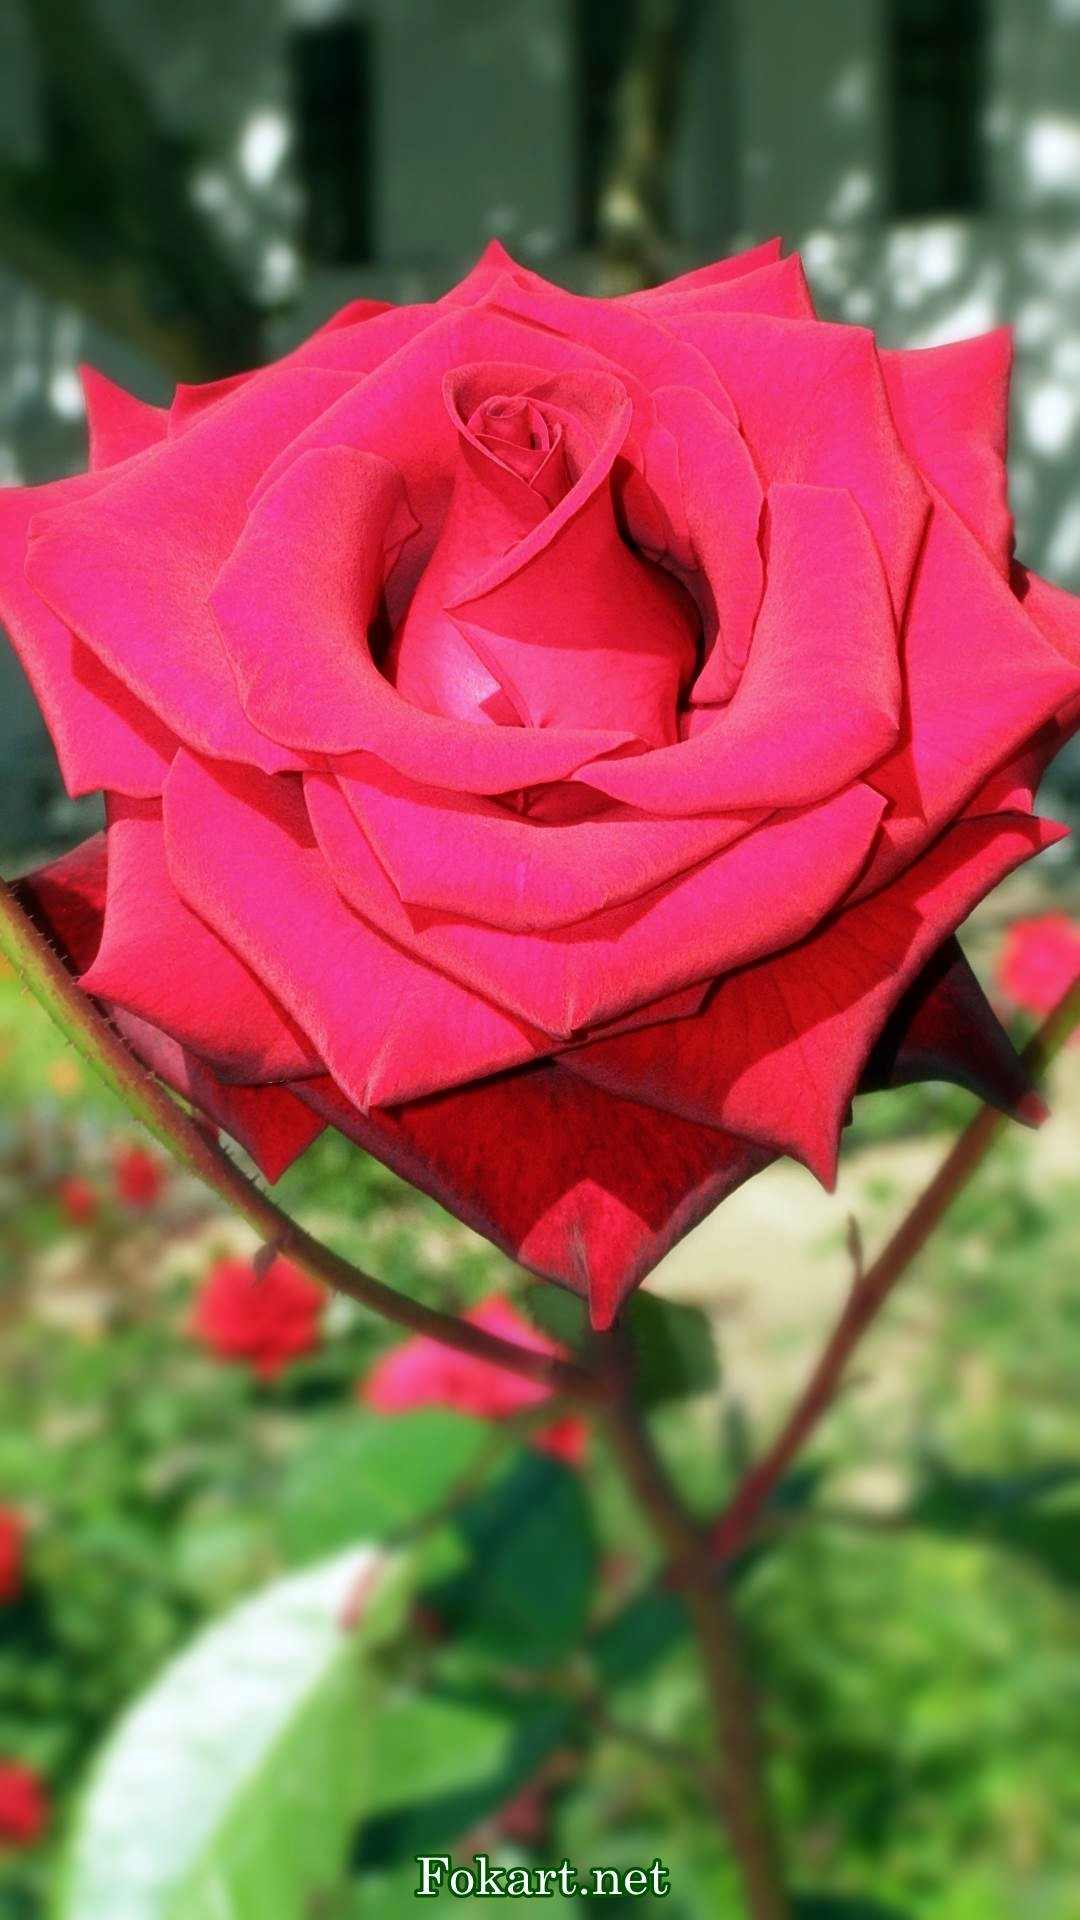 Красивая крупная роза